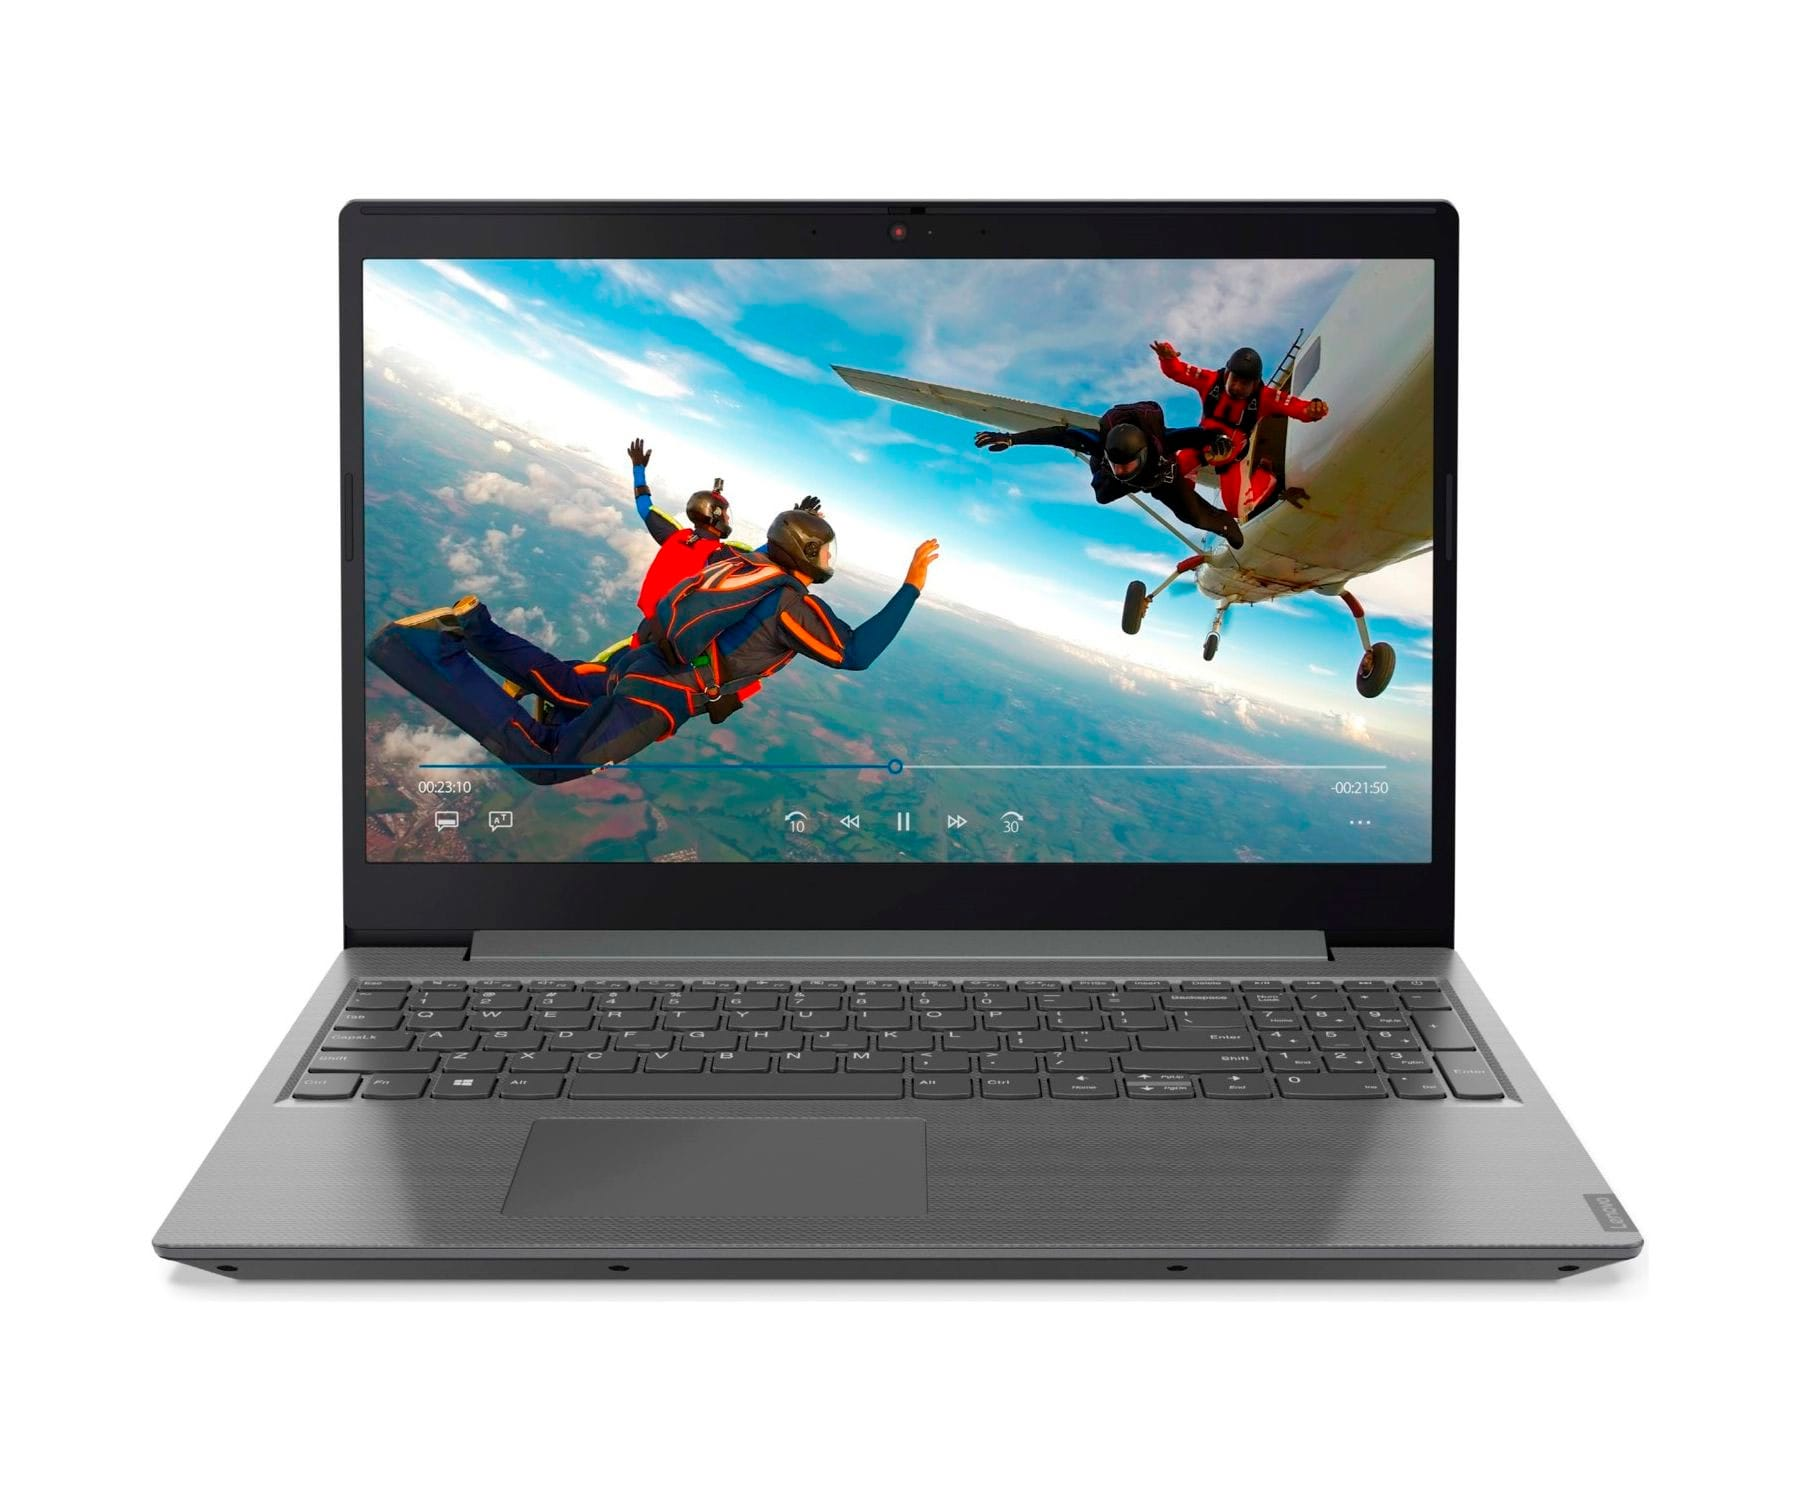 LENOVO V15-IIL GRIS PORTÁTIL 15.6'' FHD i3-1005G1 256GB SSD 8GB RAM  Windows 10 Home